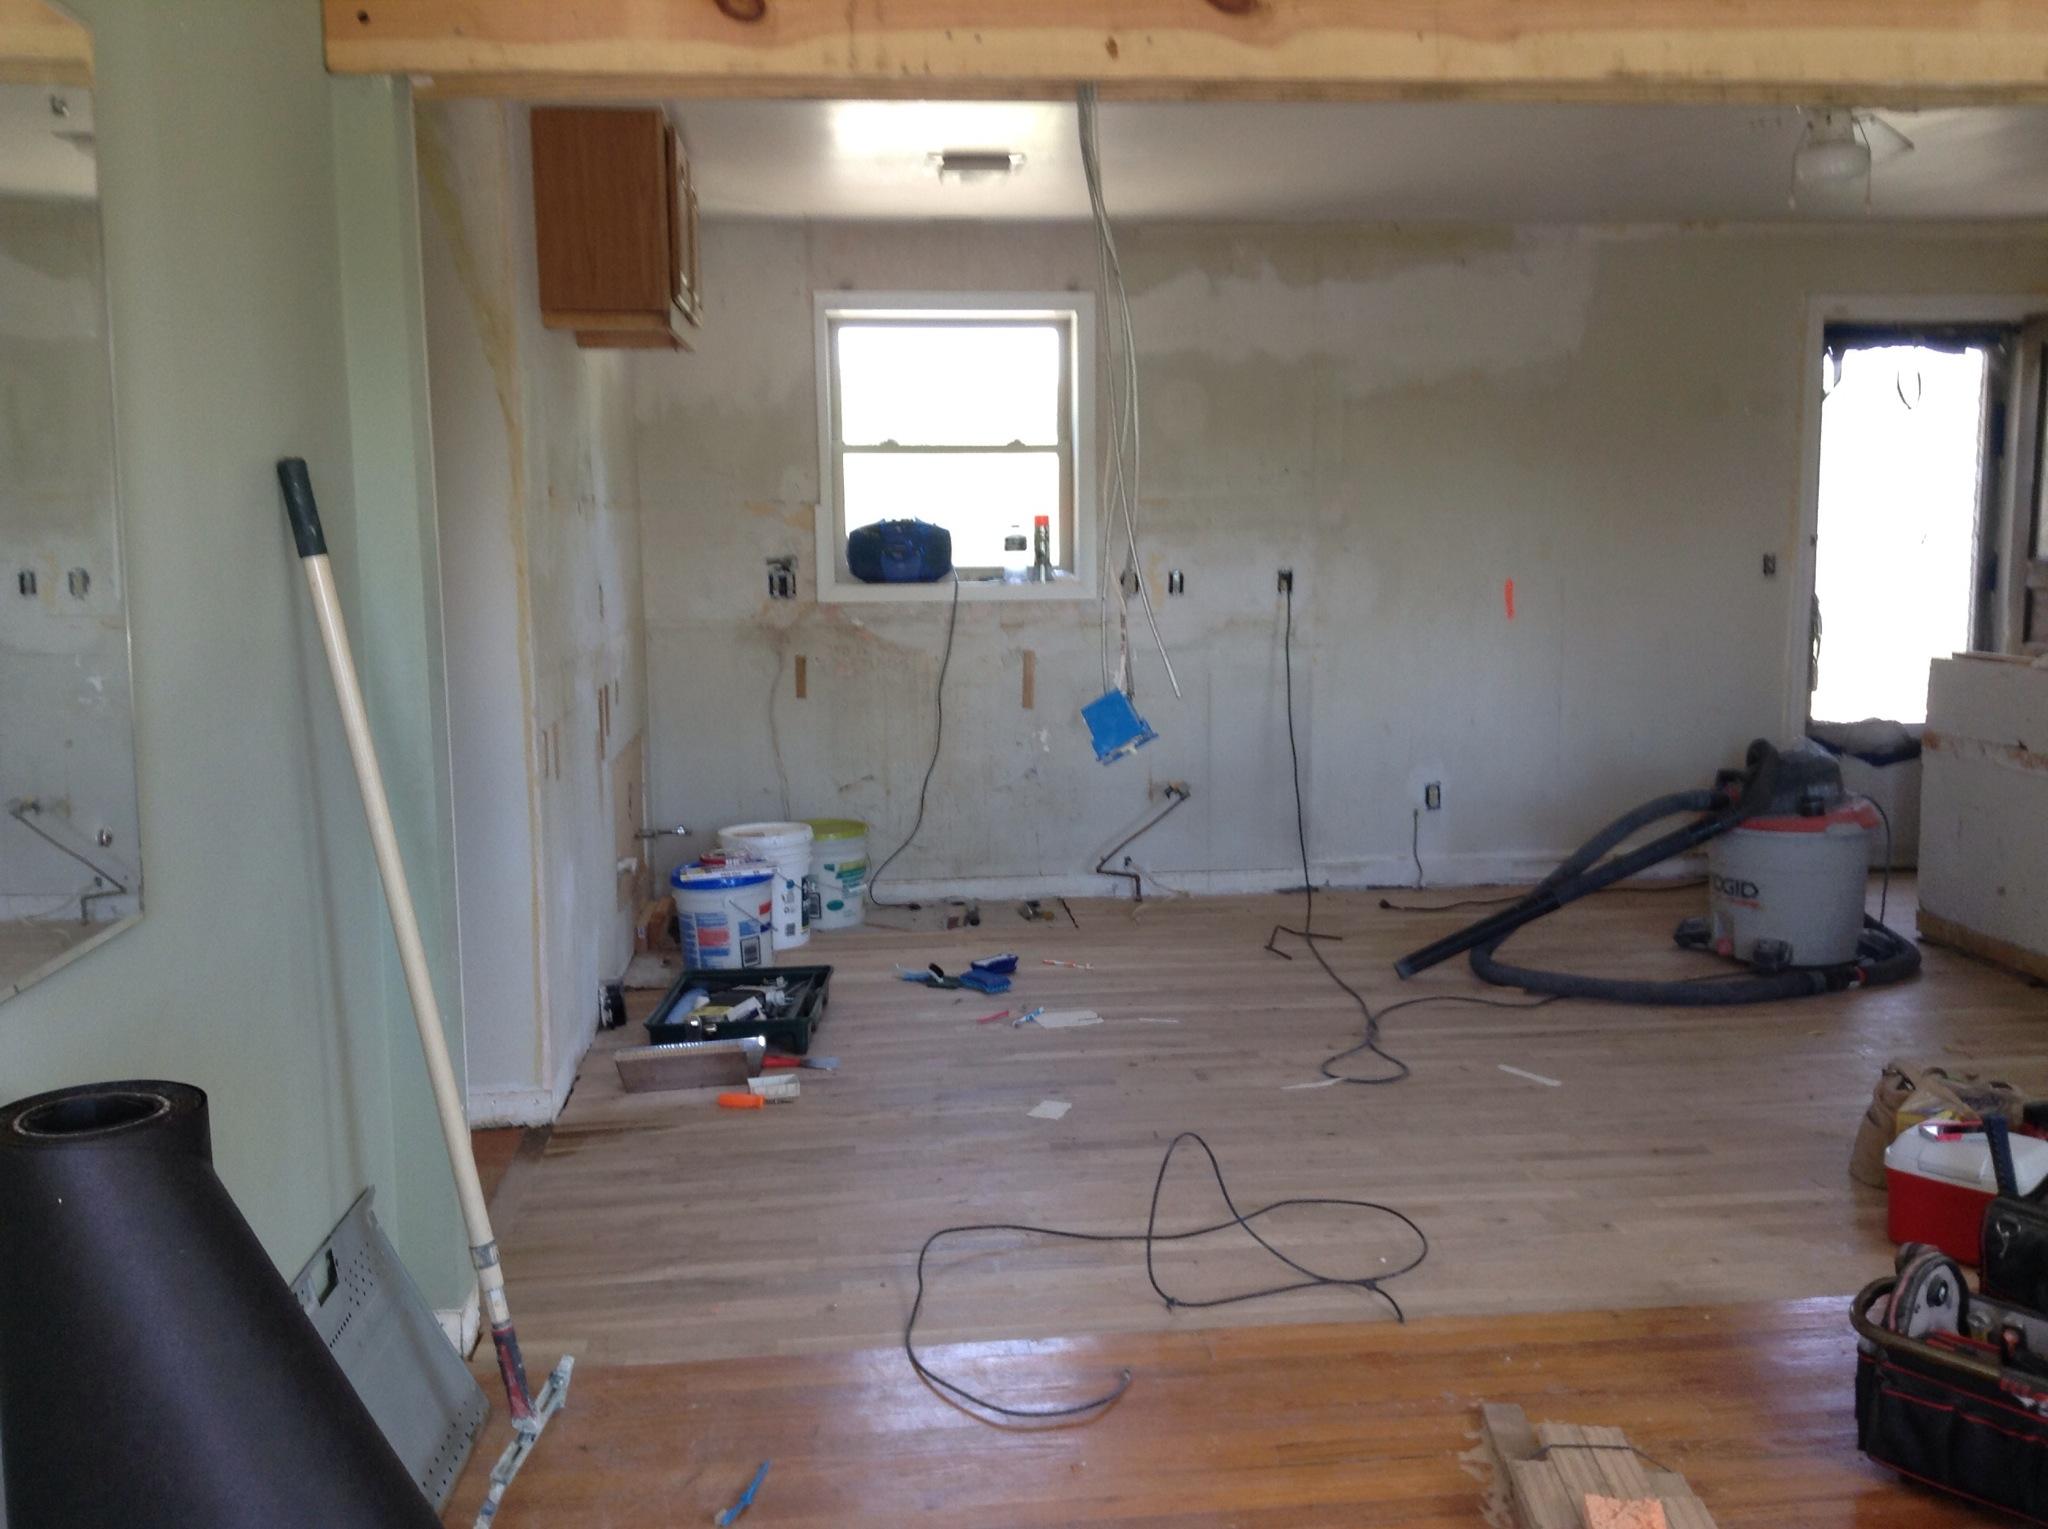 Kitchen Angle2-2a.jpg